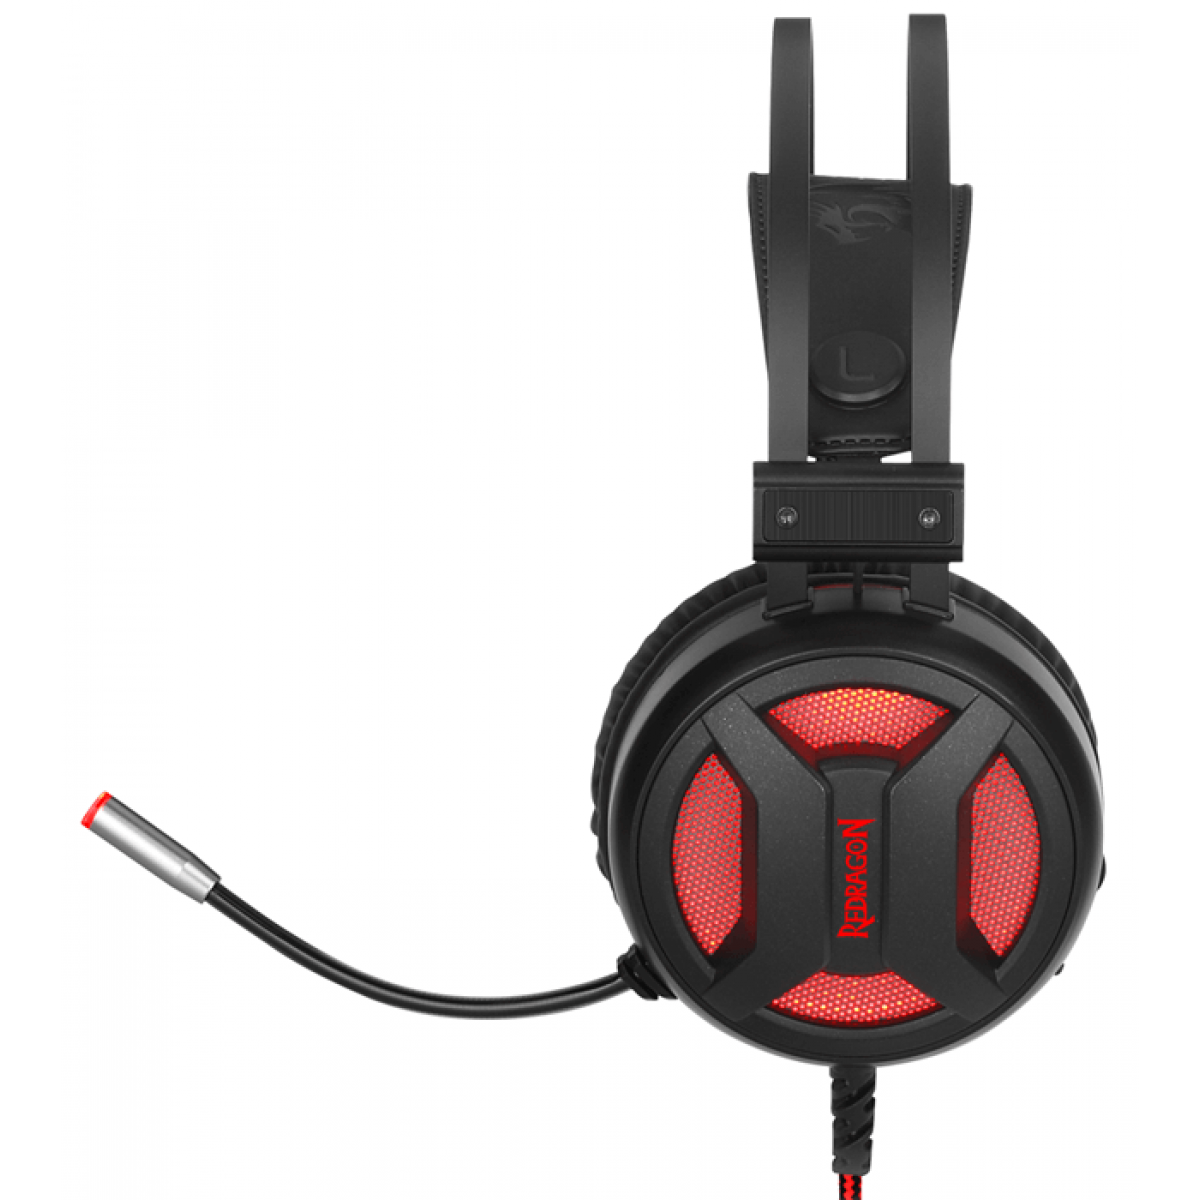 Headset Gamer Redragon Minos H210 Sorround 7.1 USB Preto/Vermelho